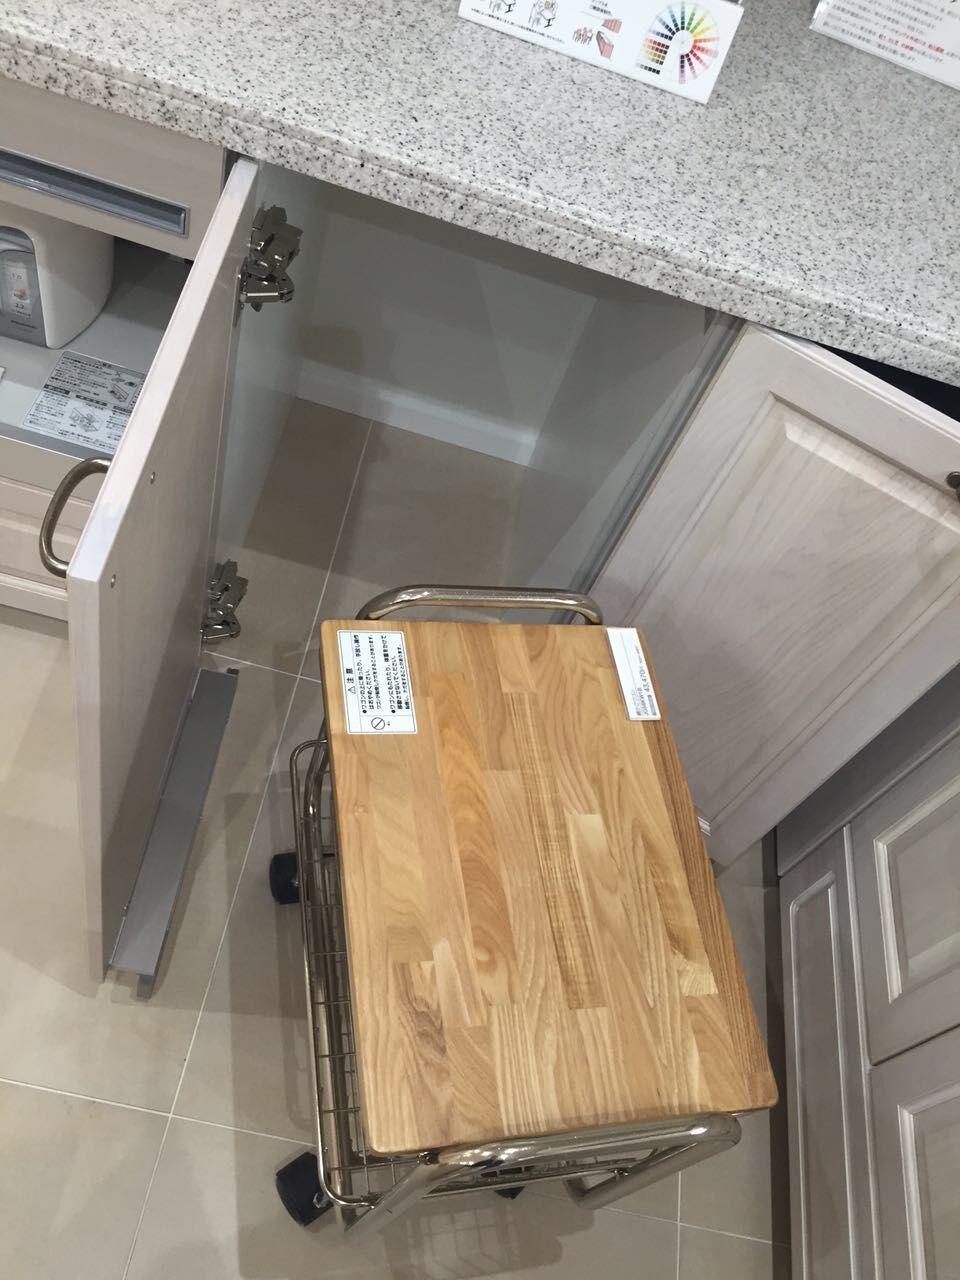 kitchen aid cabinets different color 适合中国人的现代厨房是什么样的? - 知乎